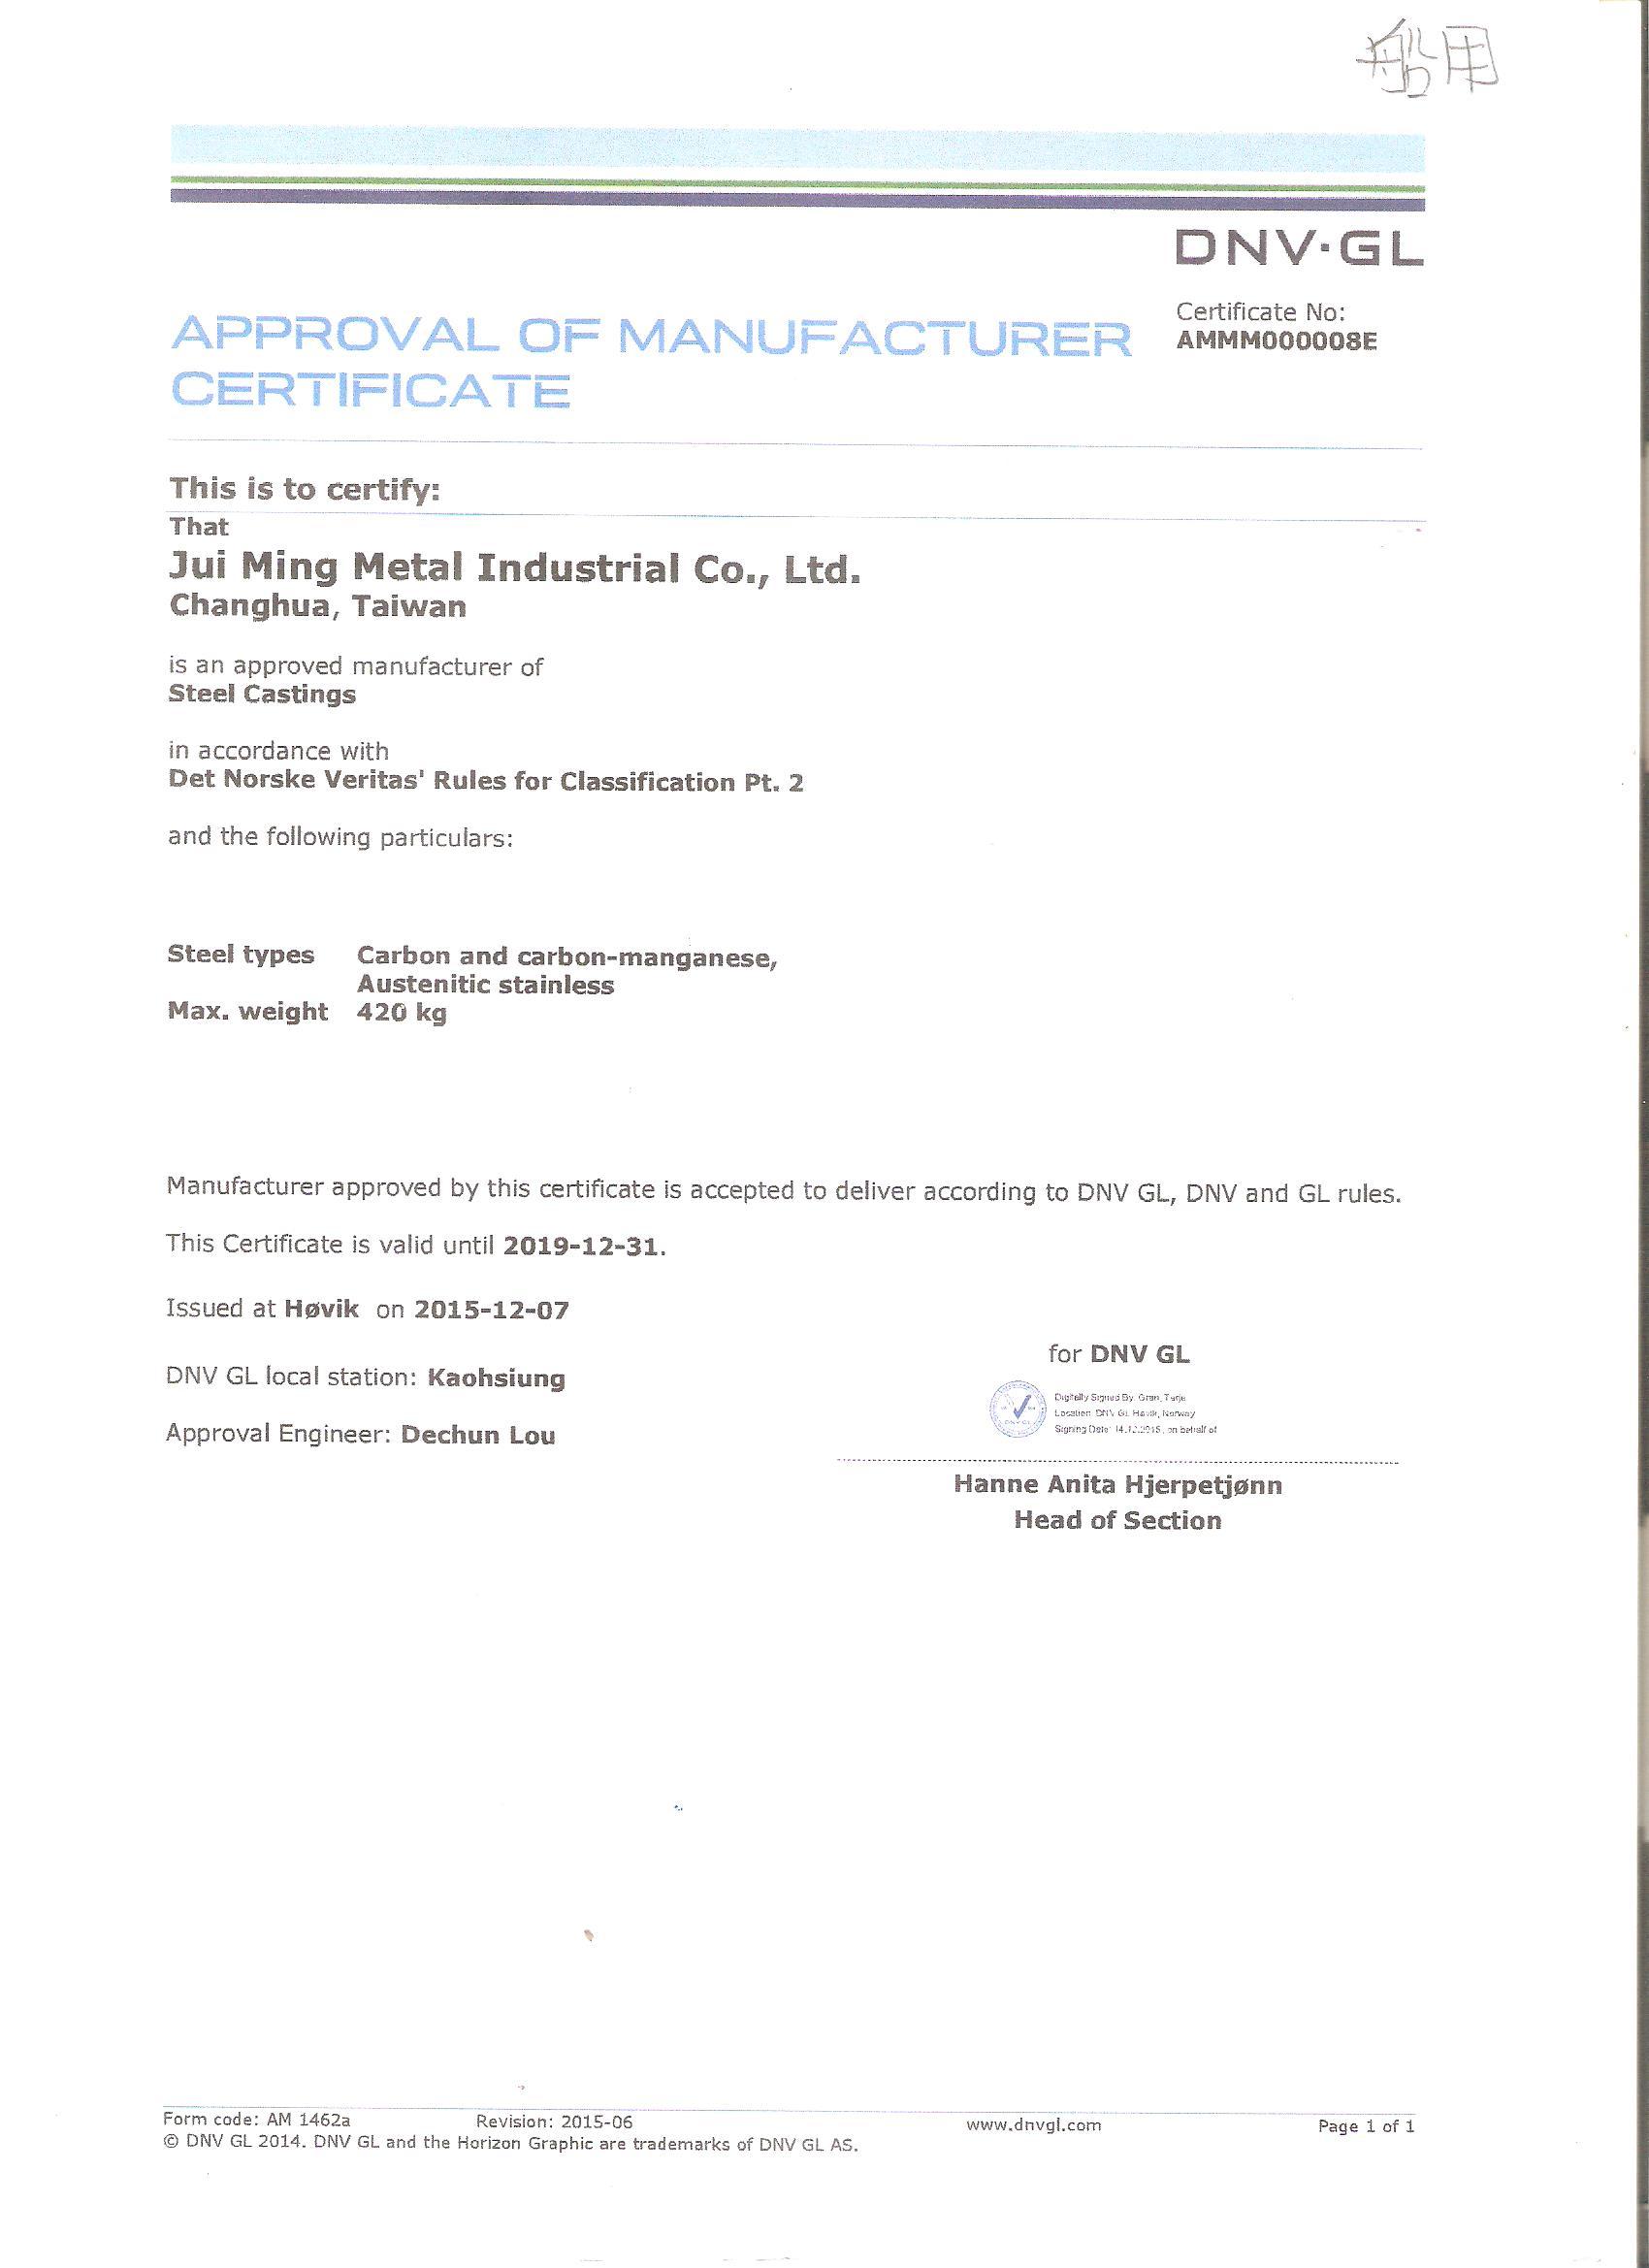 proimages/certificate/DNV.GL 船用證書.jpeg